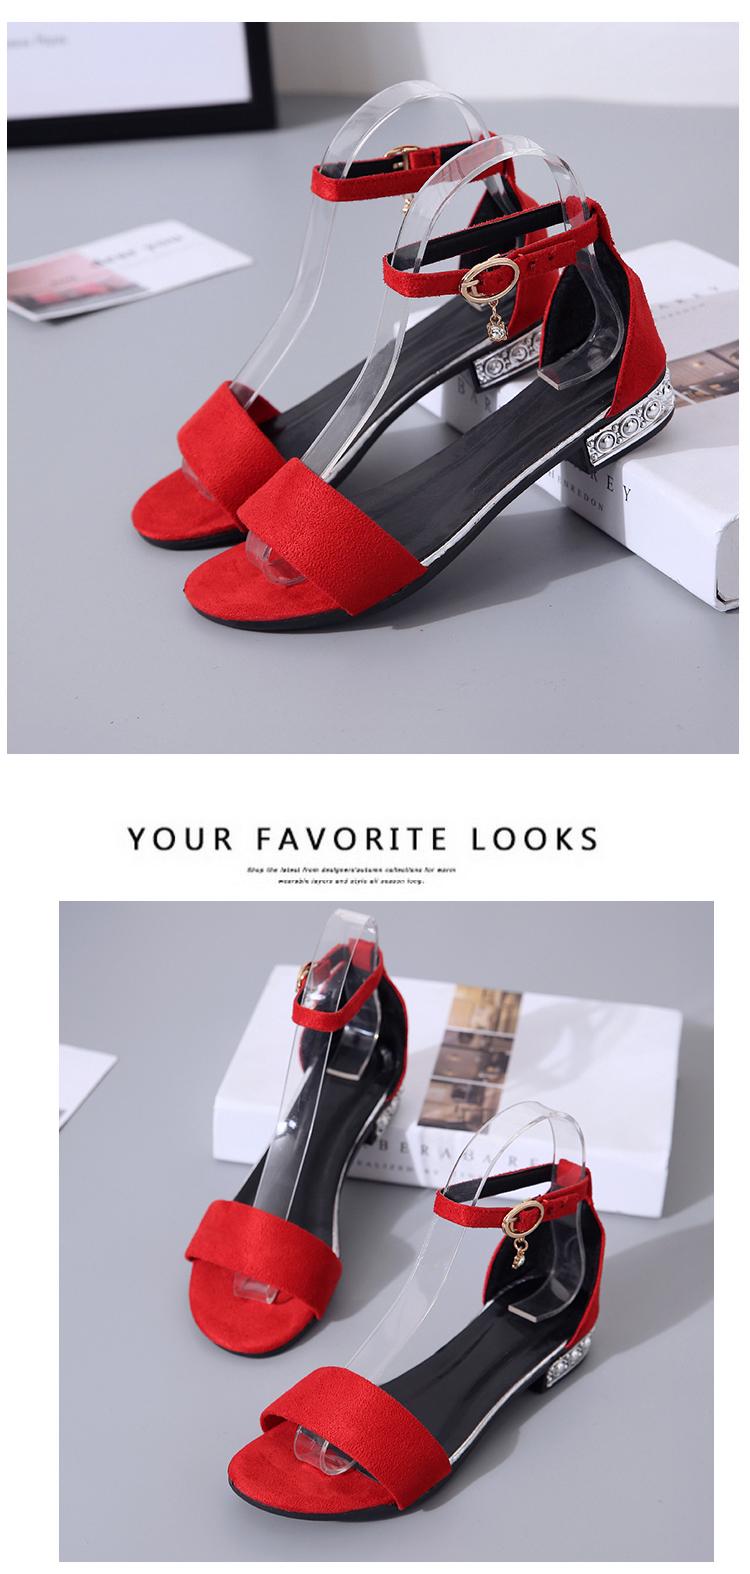 XCZJ Korean Style 2018 Summer Women Sandals Open Toe Flip Flops Women's Flat Sandle With low Women Shoes Gladiator student Shoes 14